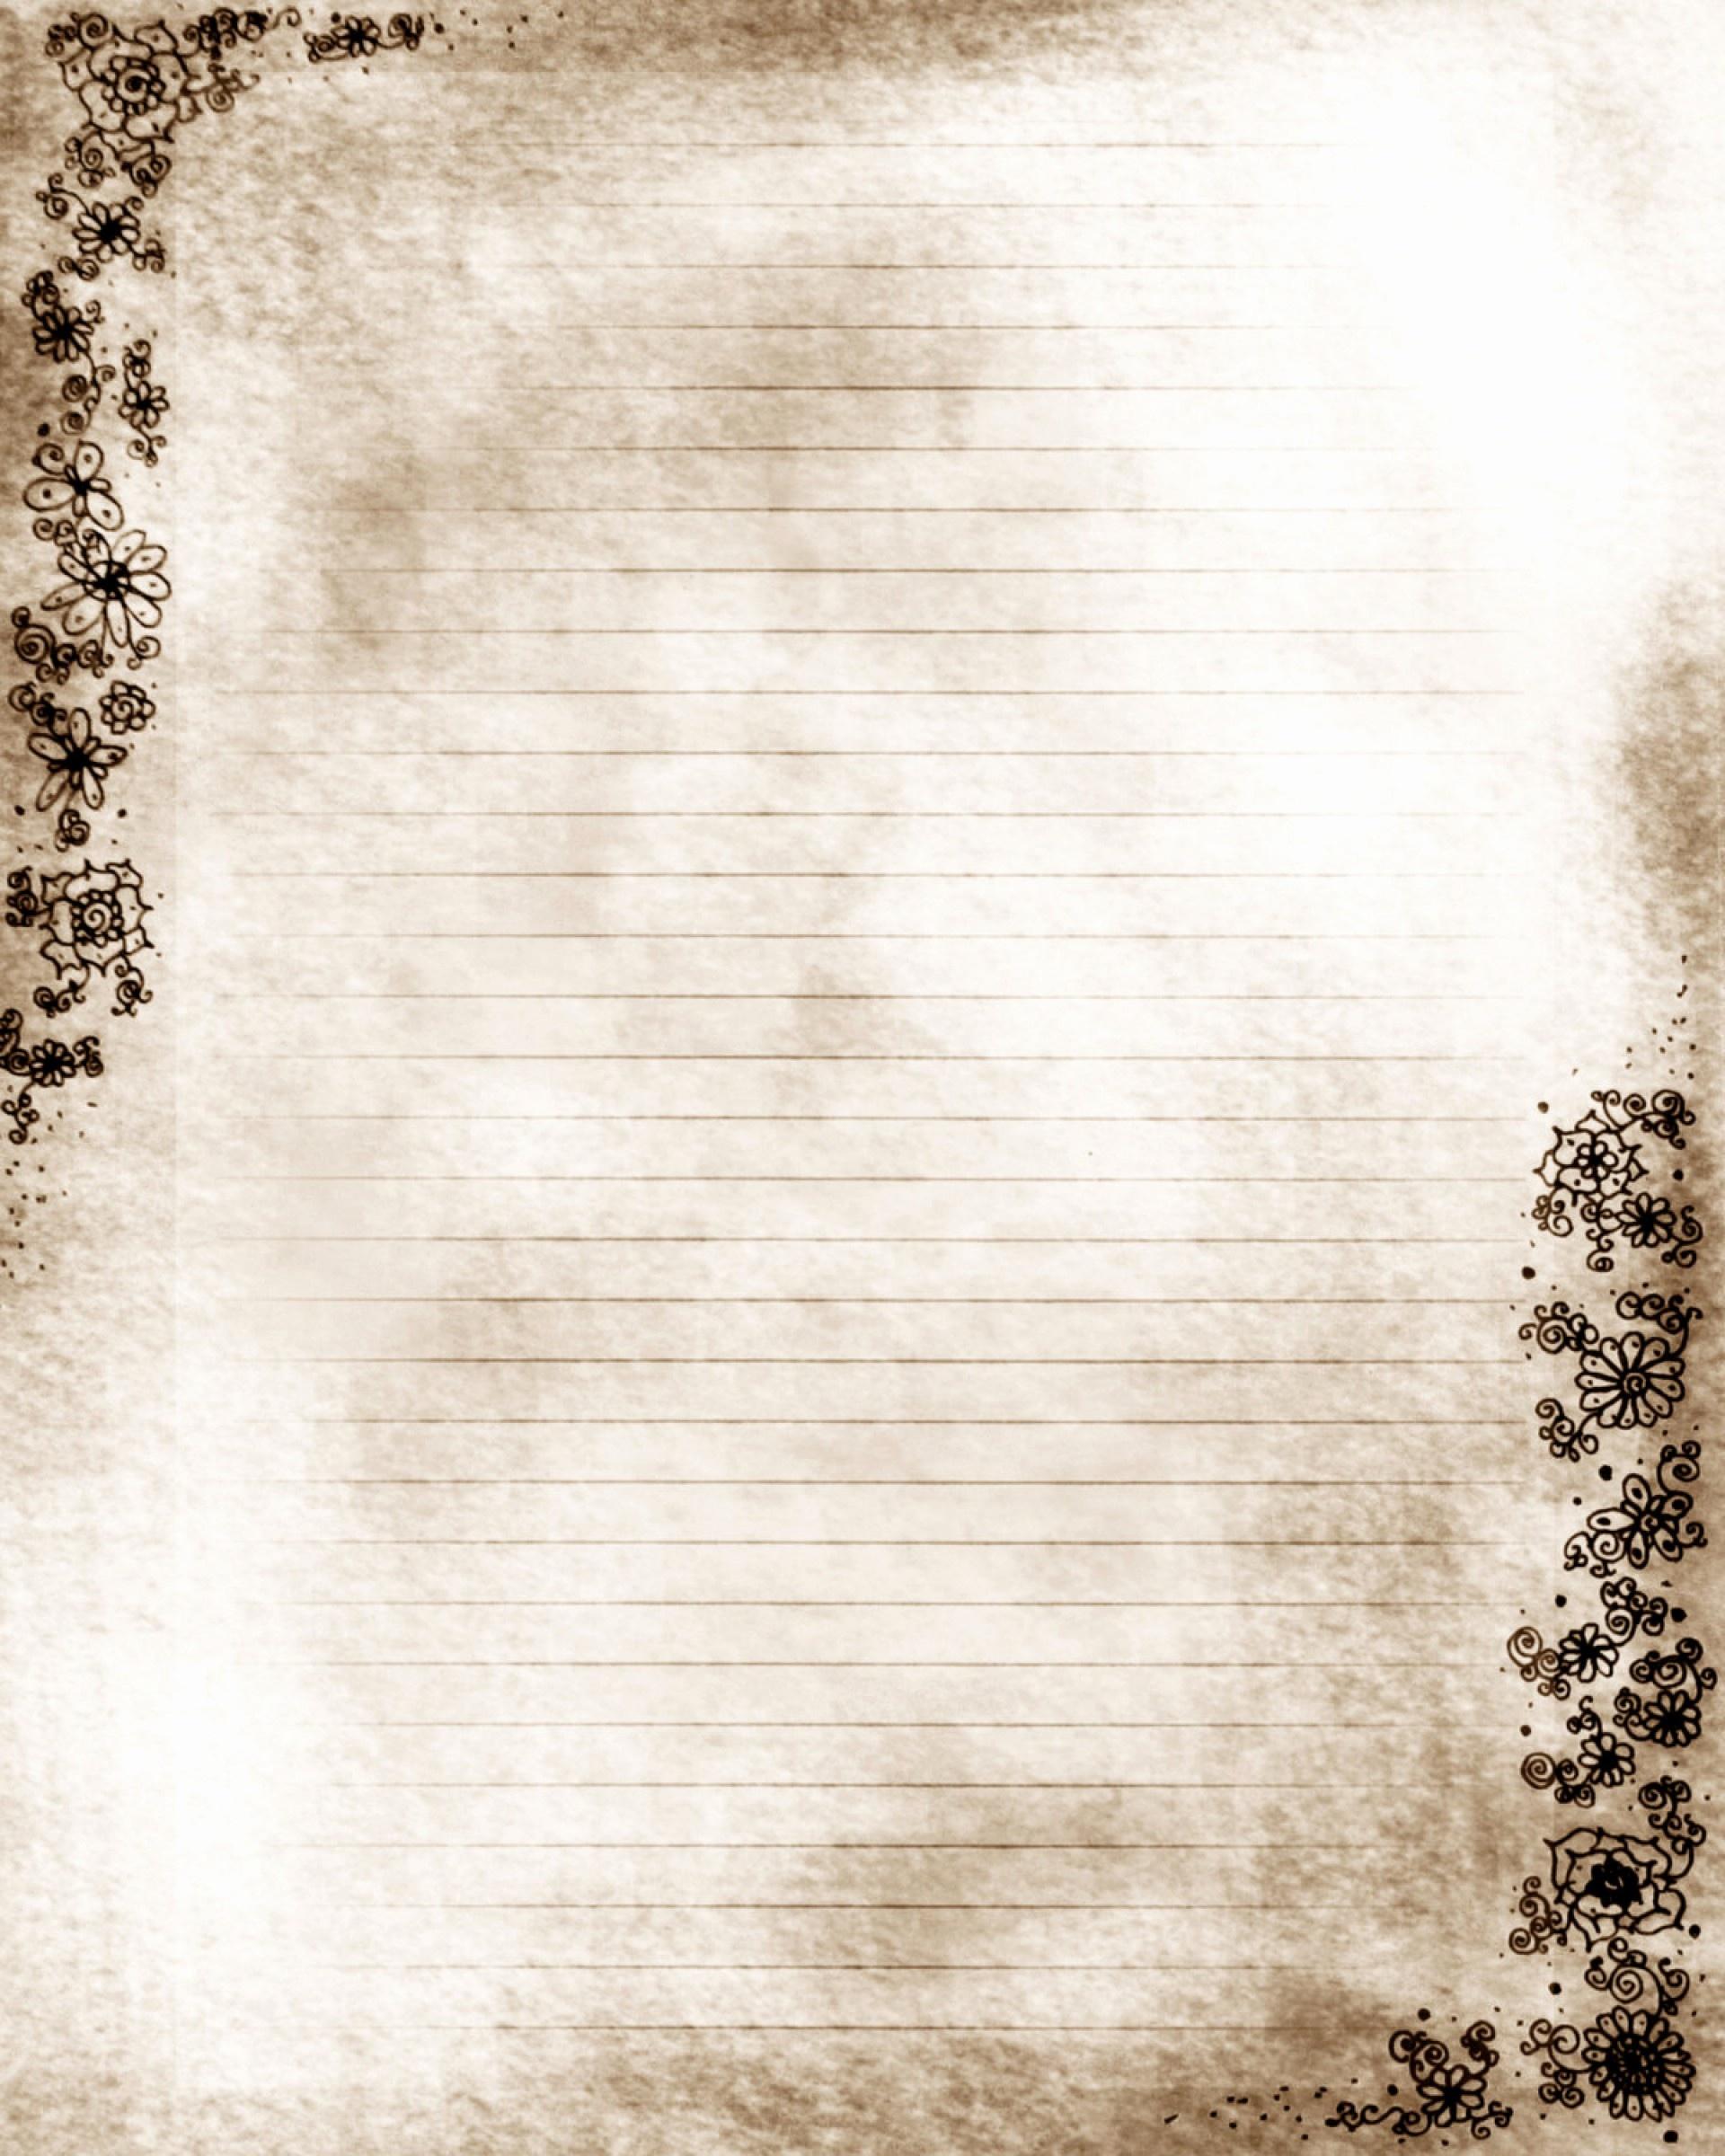 023 Template Ideas Free Printable Elegant Stationery Templates Paper - Free Printable Lined Stationery